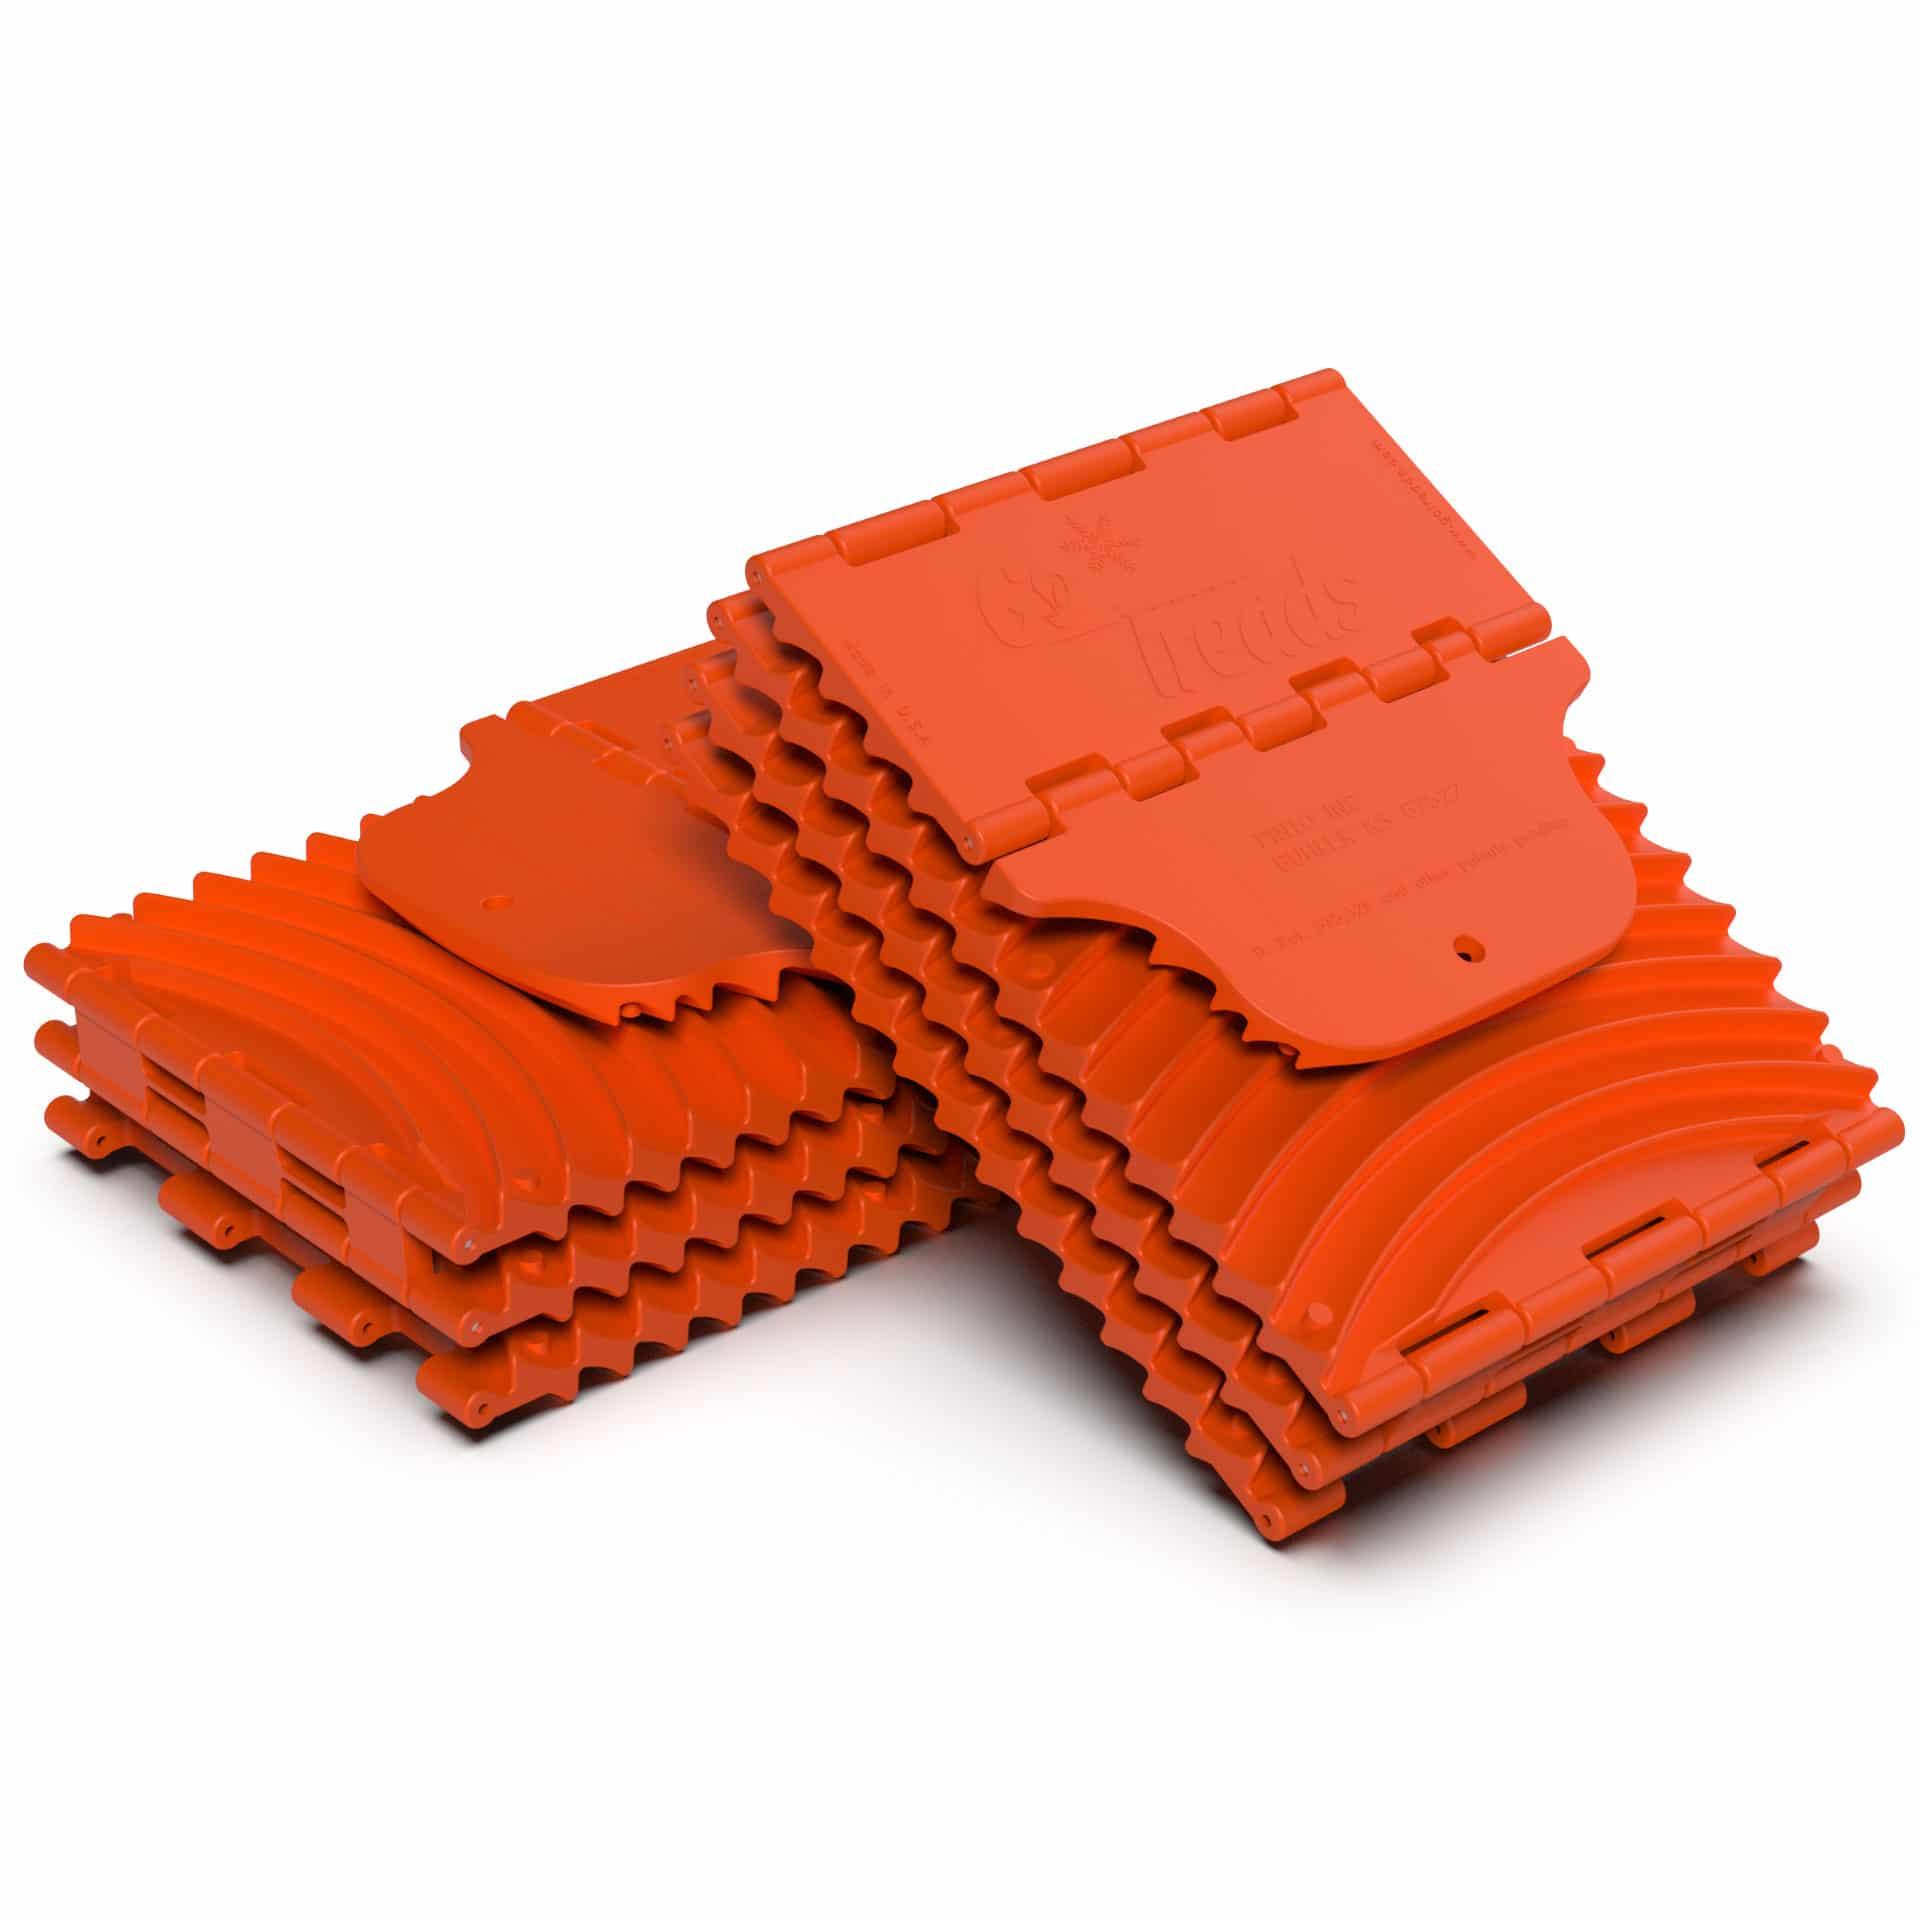 GoTreads Standard Orange Folded